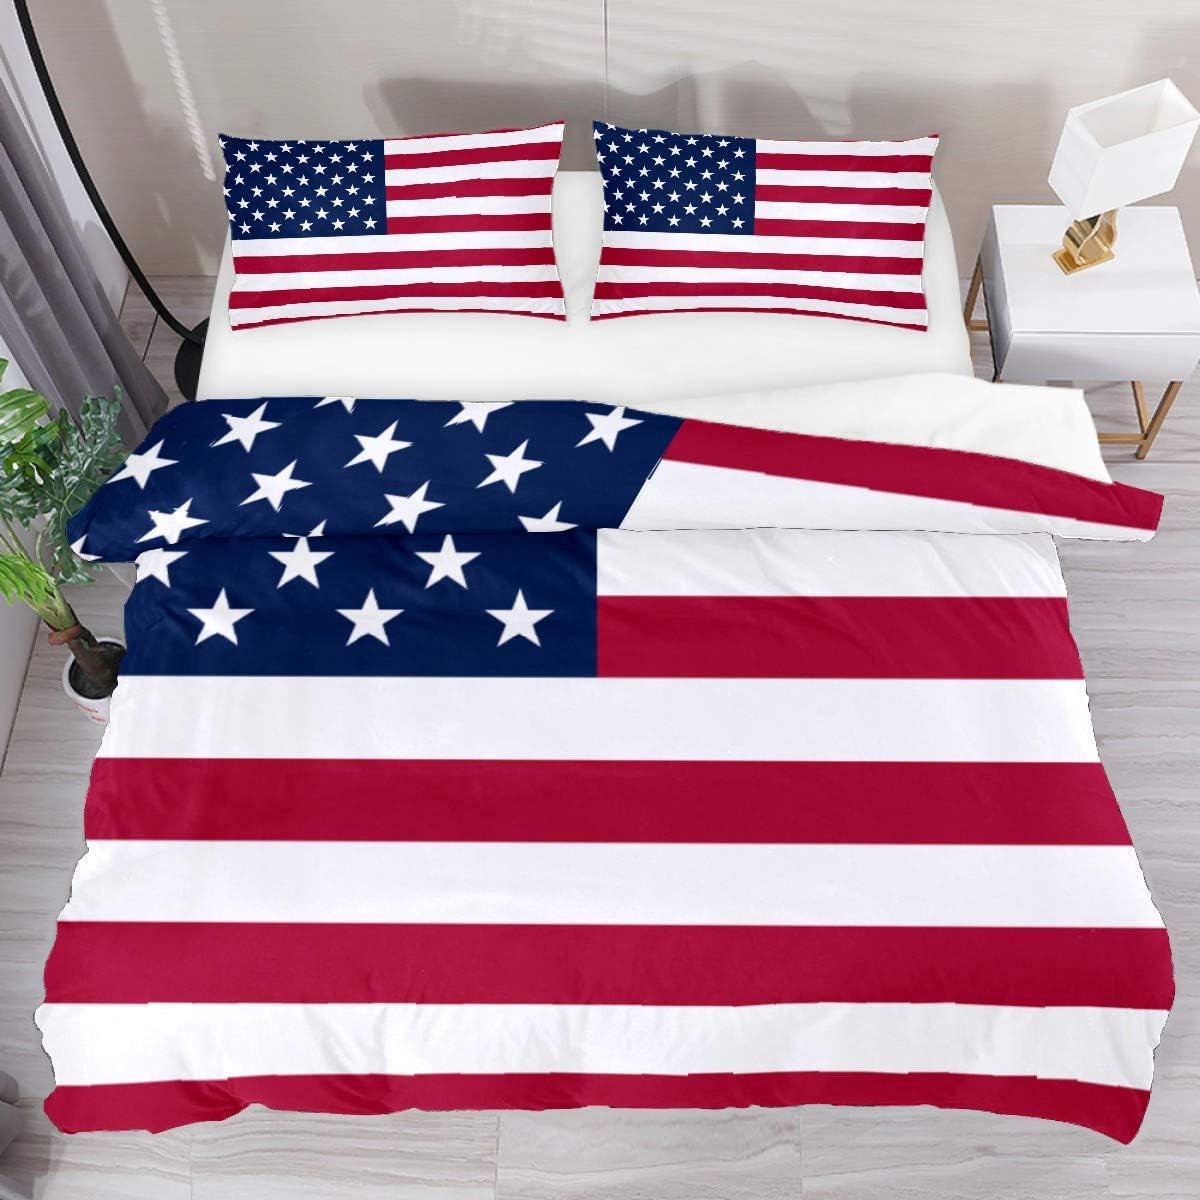 American Flag Comforter Set Soft Duvet Be Fashion Cover Full Piece 3 Brand Cheap Sale Venue